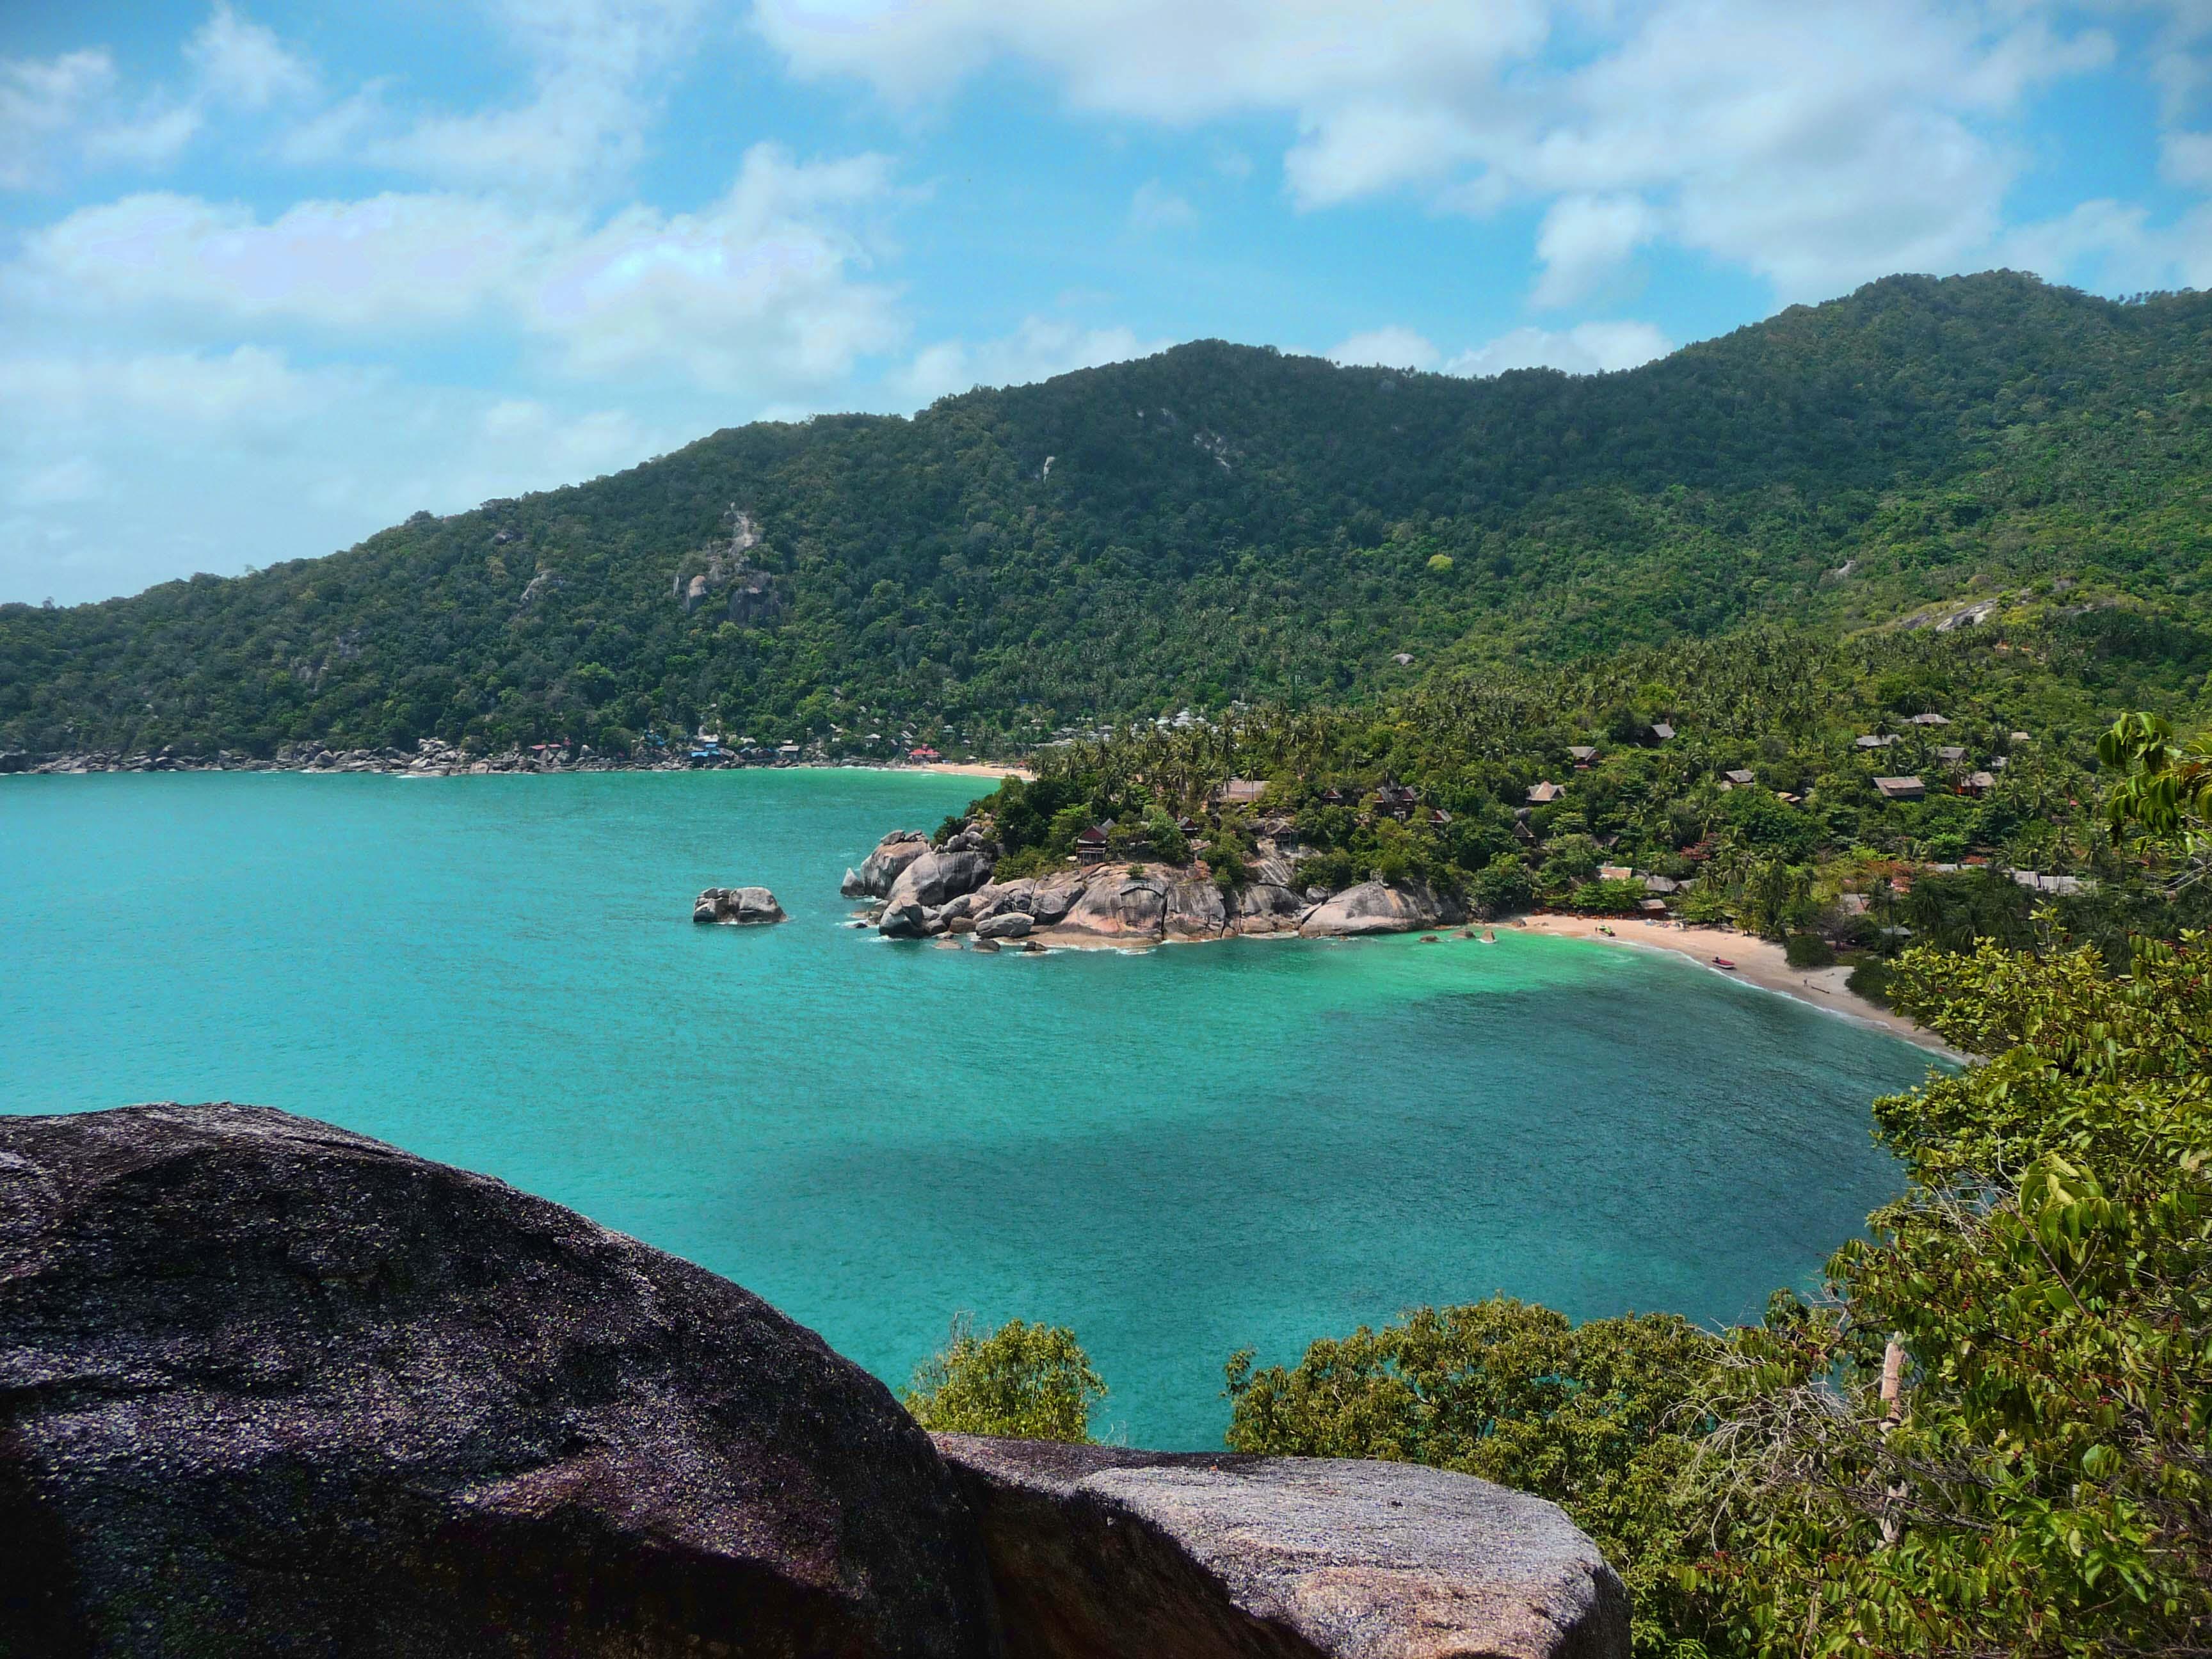 Koh Phangan Thailand  city images : Isola di Koh Phangan. Un paradiso nella Thailandia del Sud